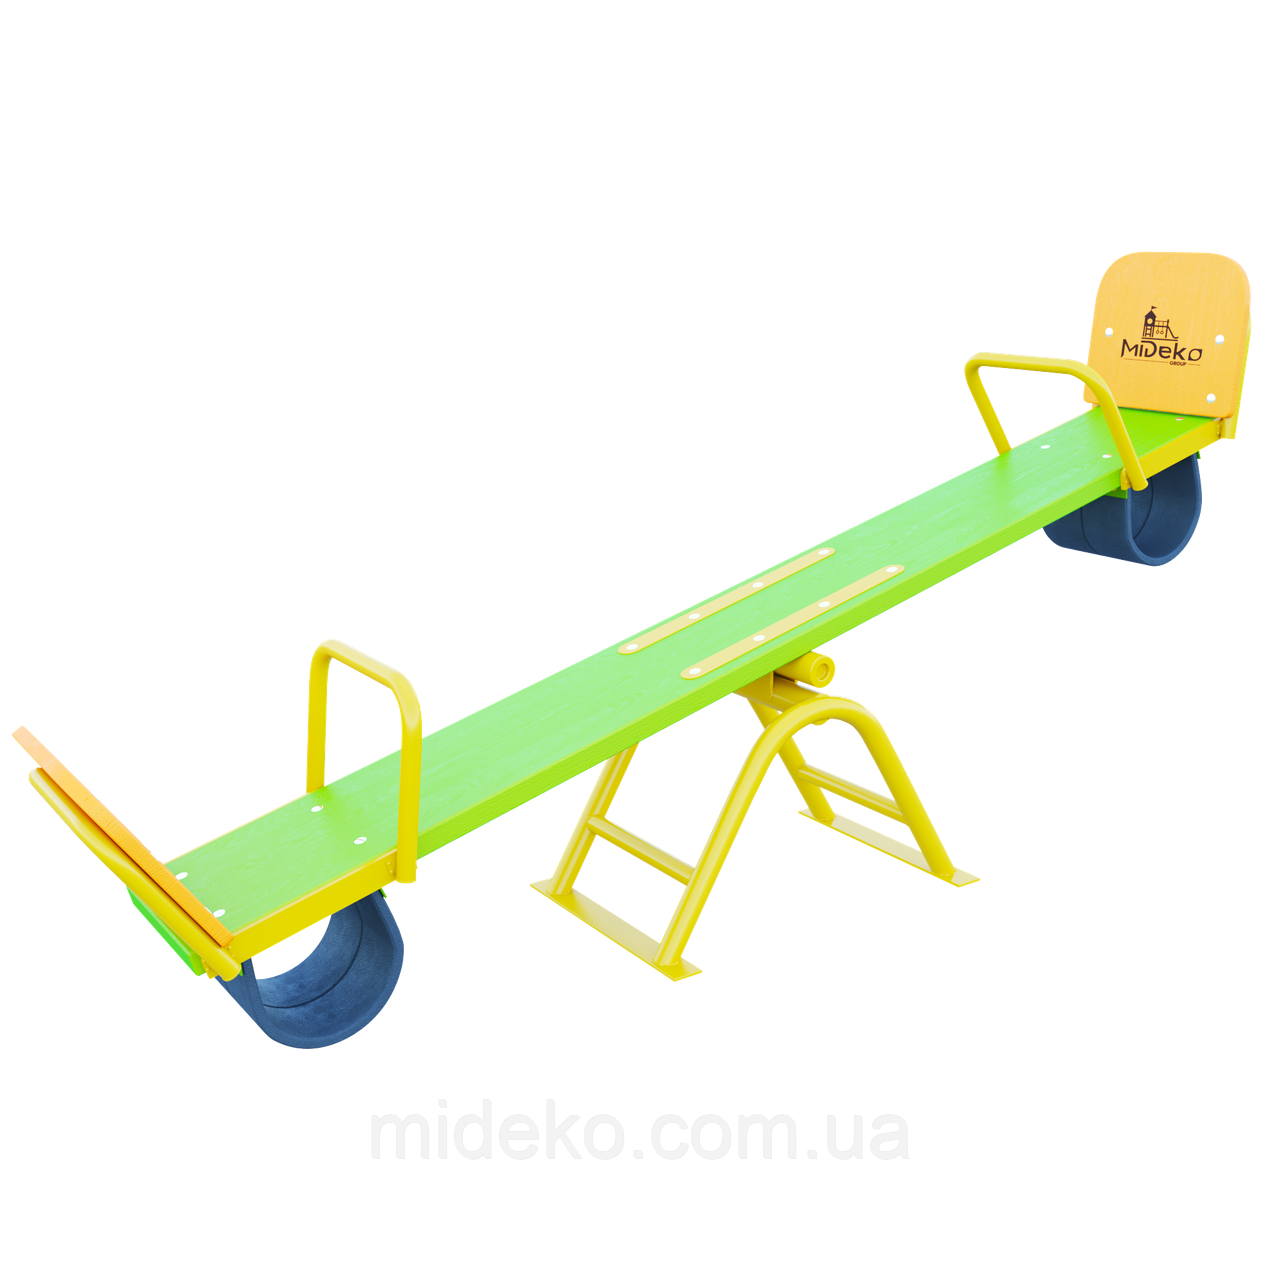 Гойдалка-балансир великий MIDEKO